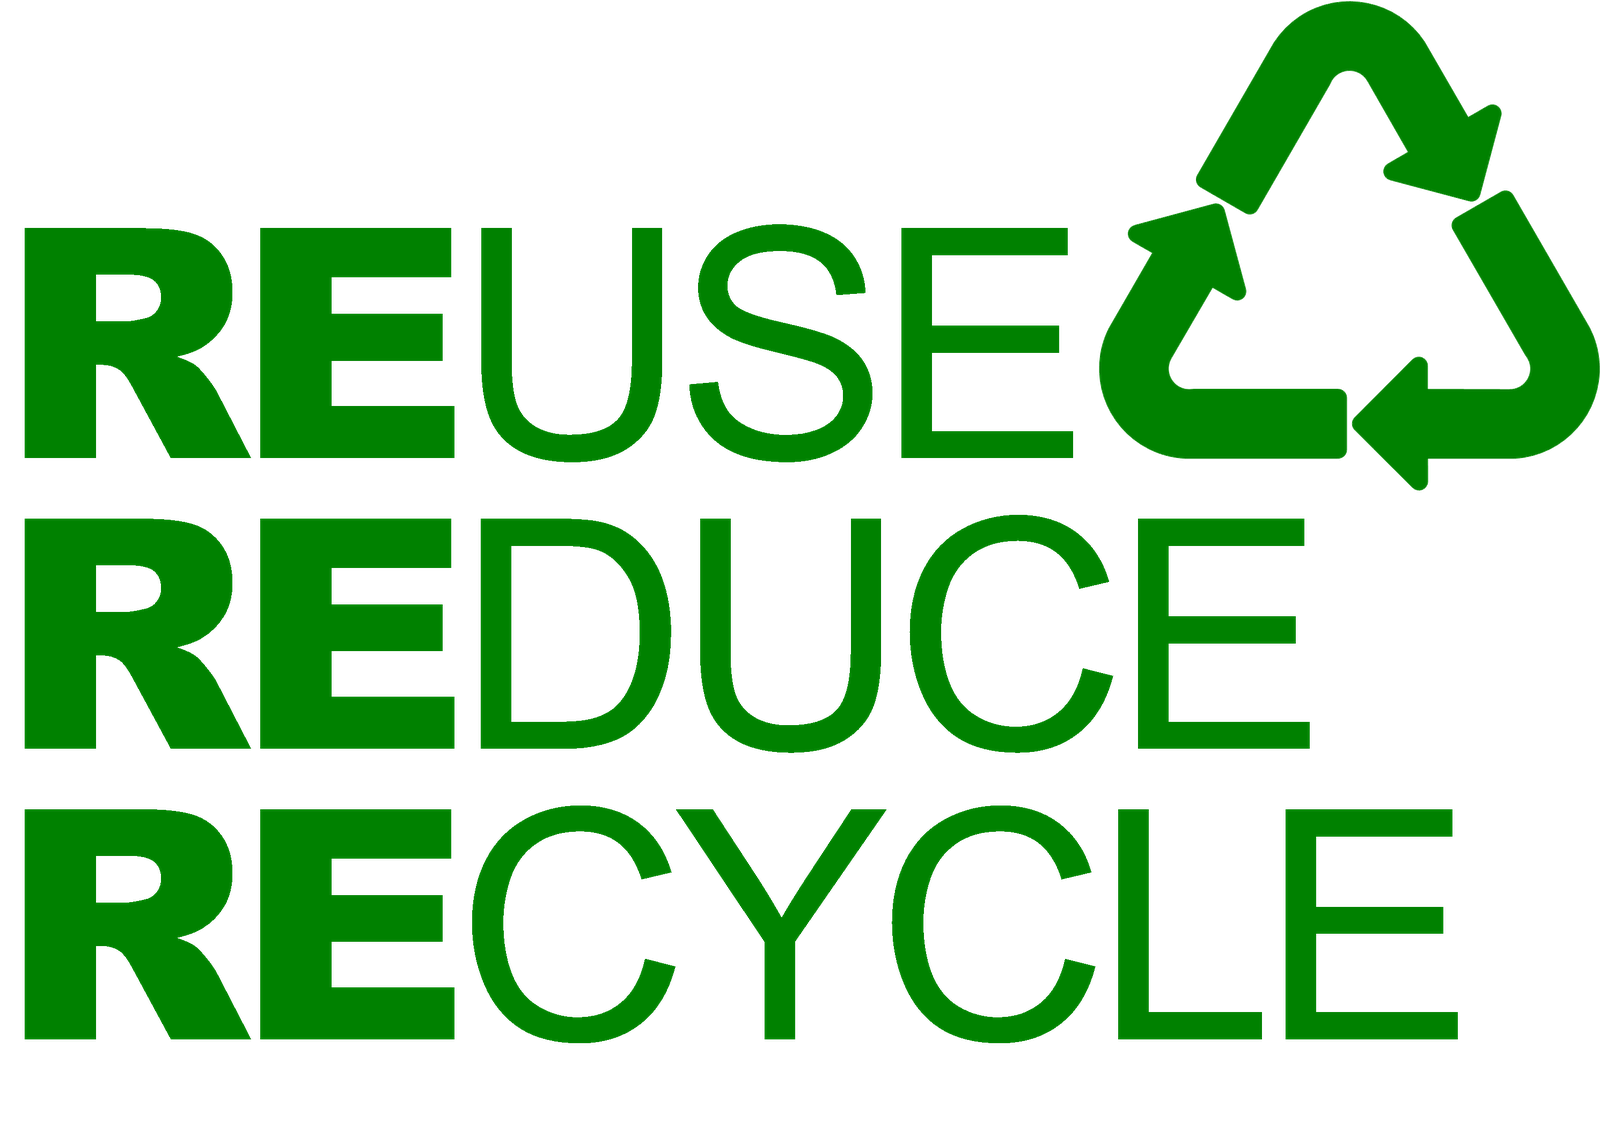 1600x1137 Reuse, Reduce, Recycle Railsaverpro New Packaging Reuse Recycle